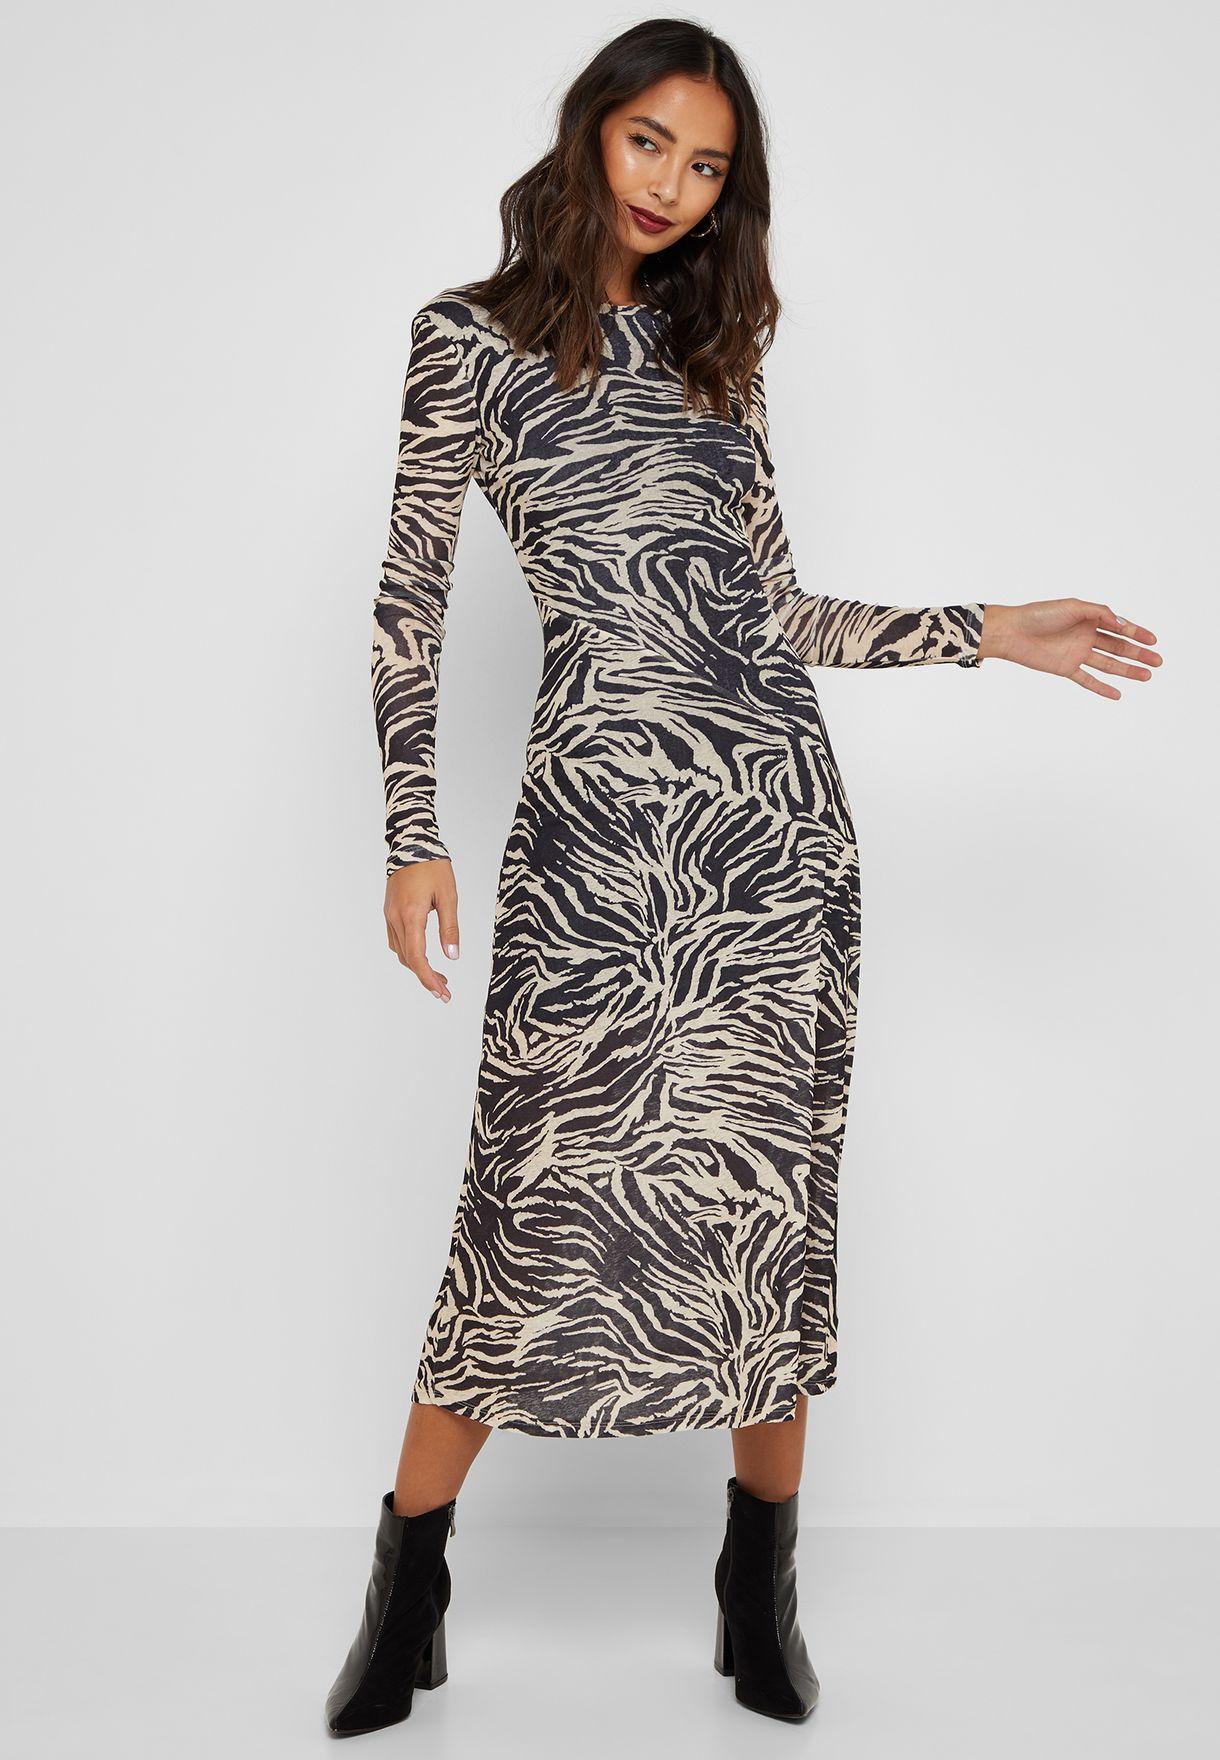 38e7e68ccd74 Shop Topshop prints Zebra Print Mesh Midi Dress 10J05QSTN for Women ...